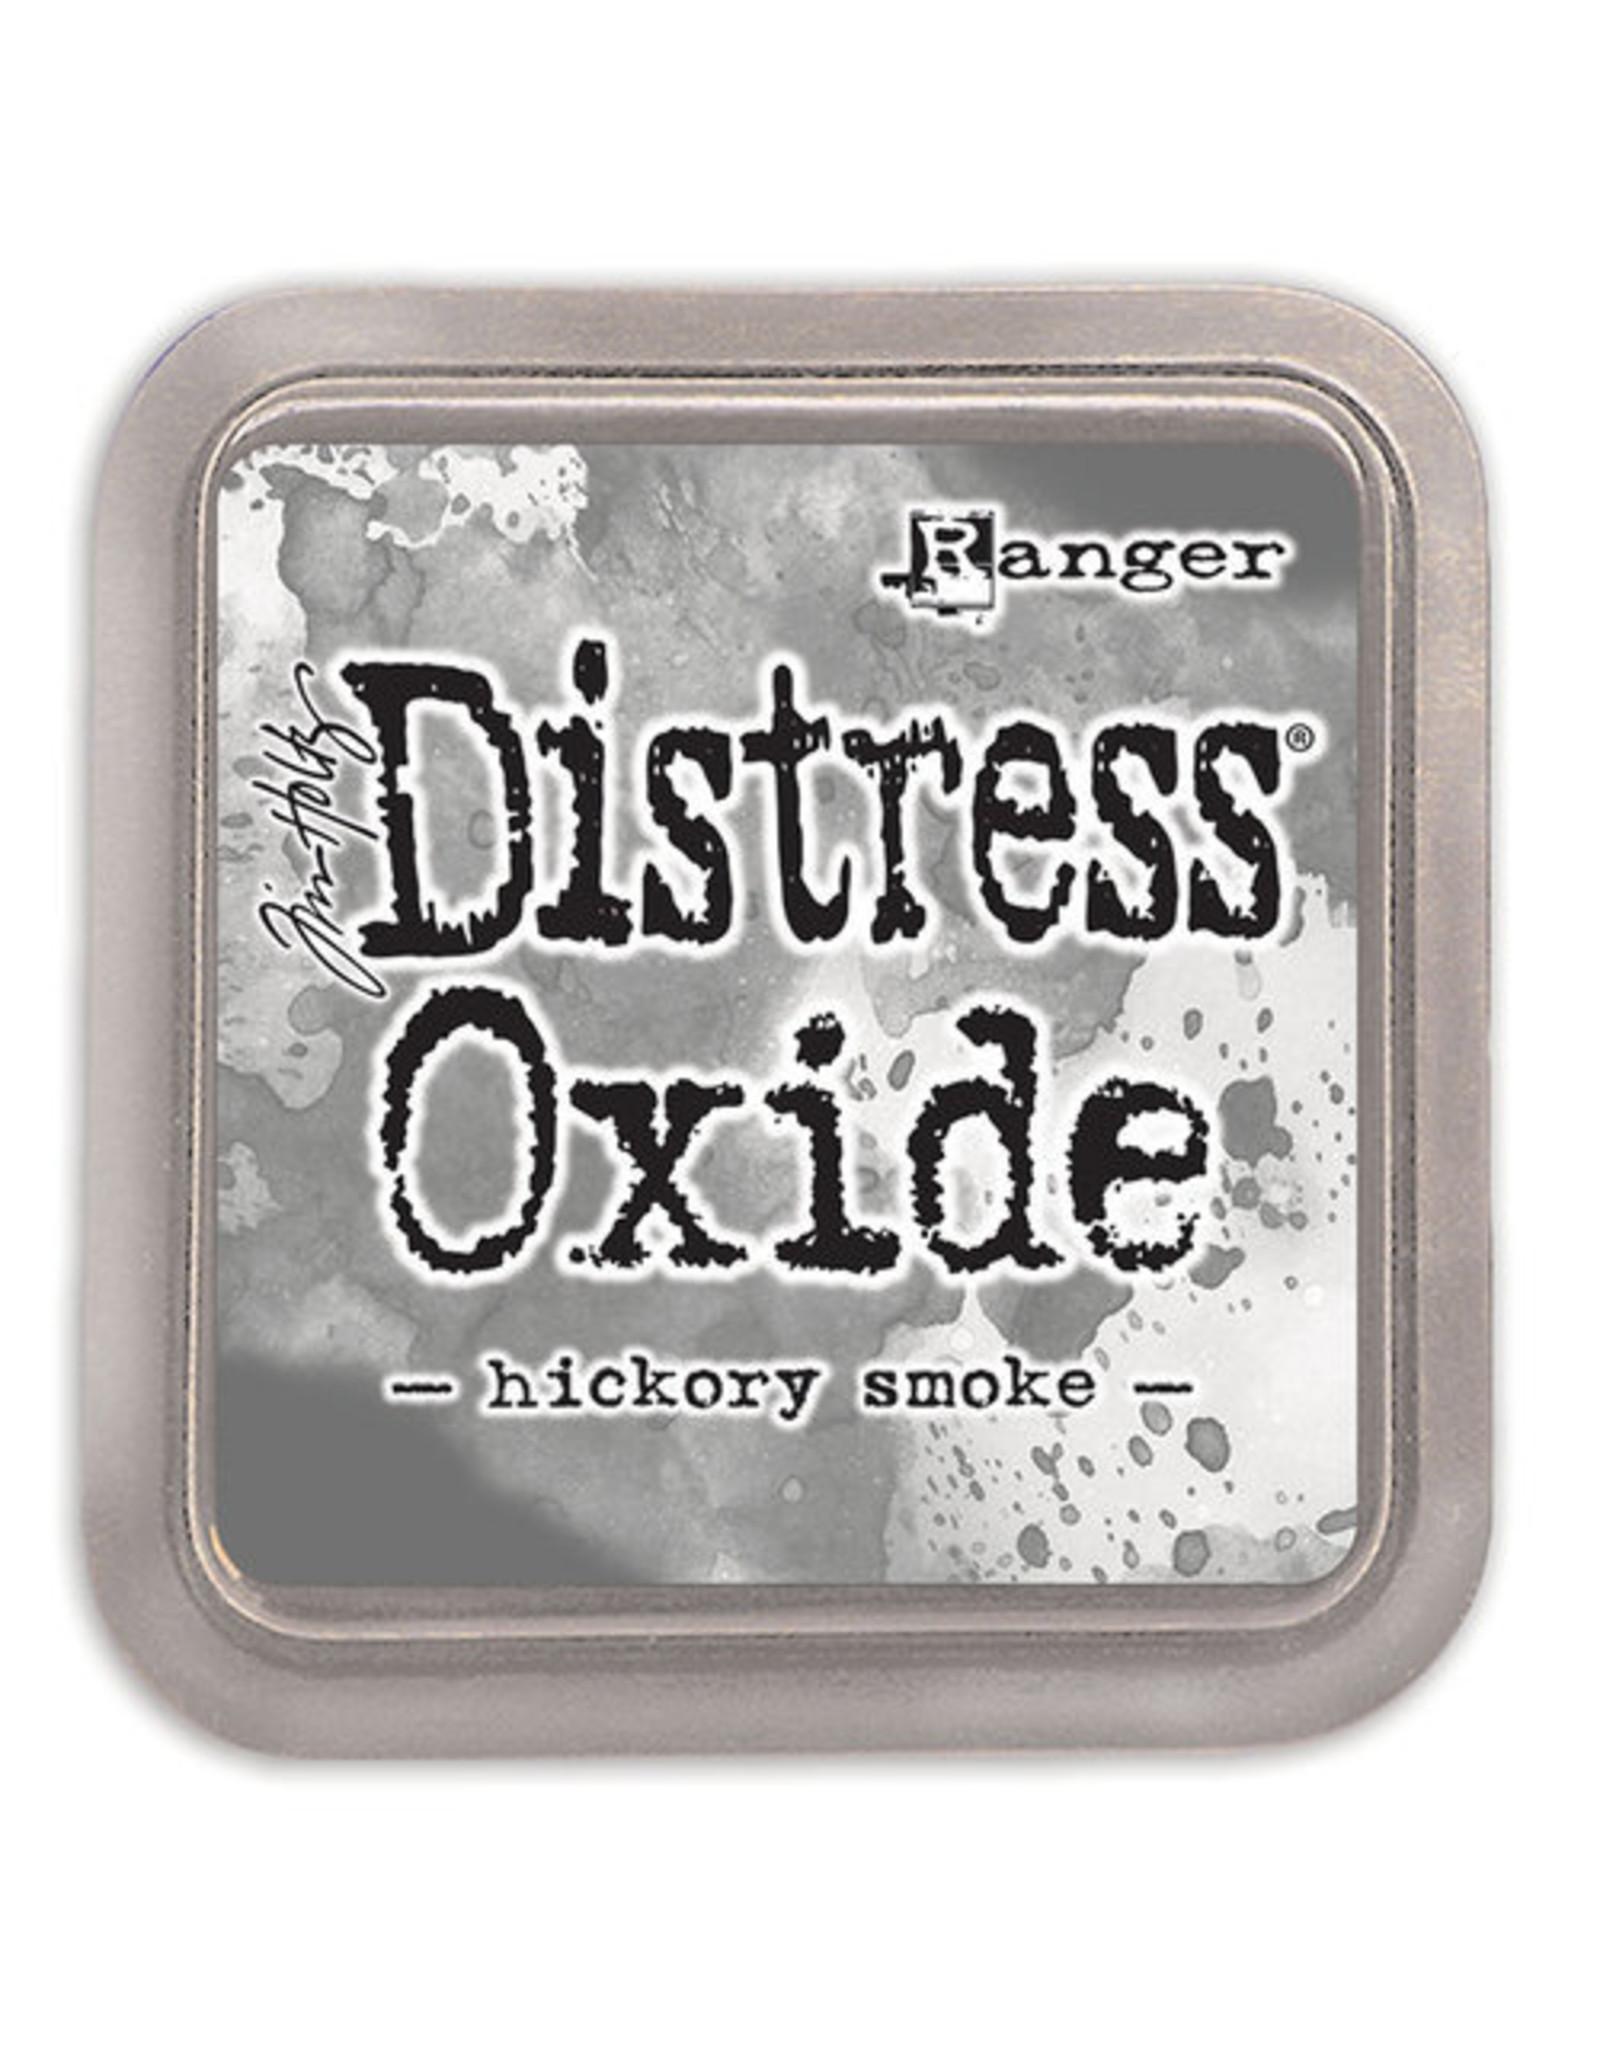 Ranger Distress Oxide Ink Pad - Hickory Smoke